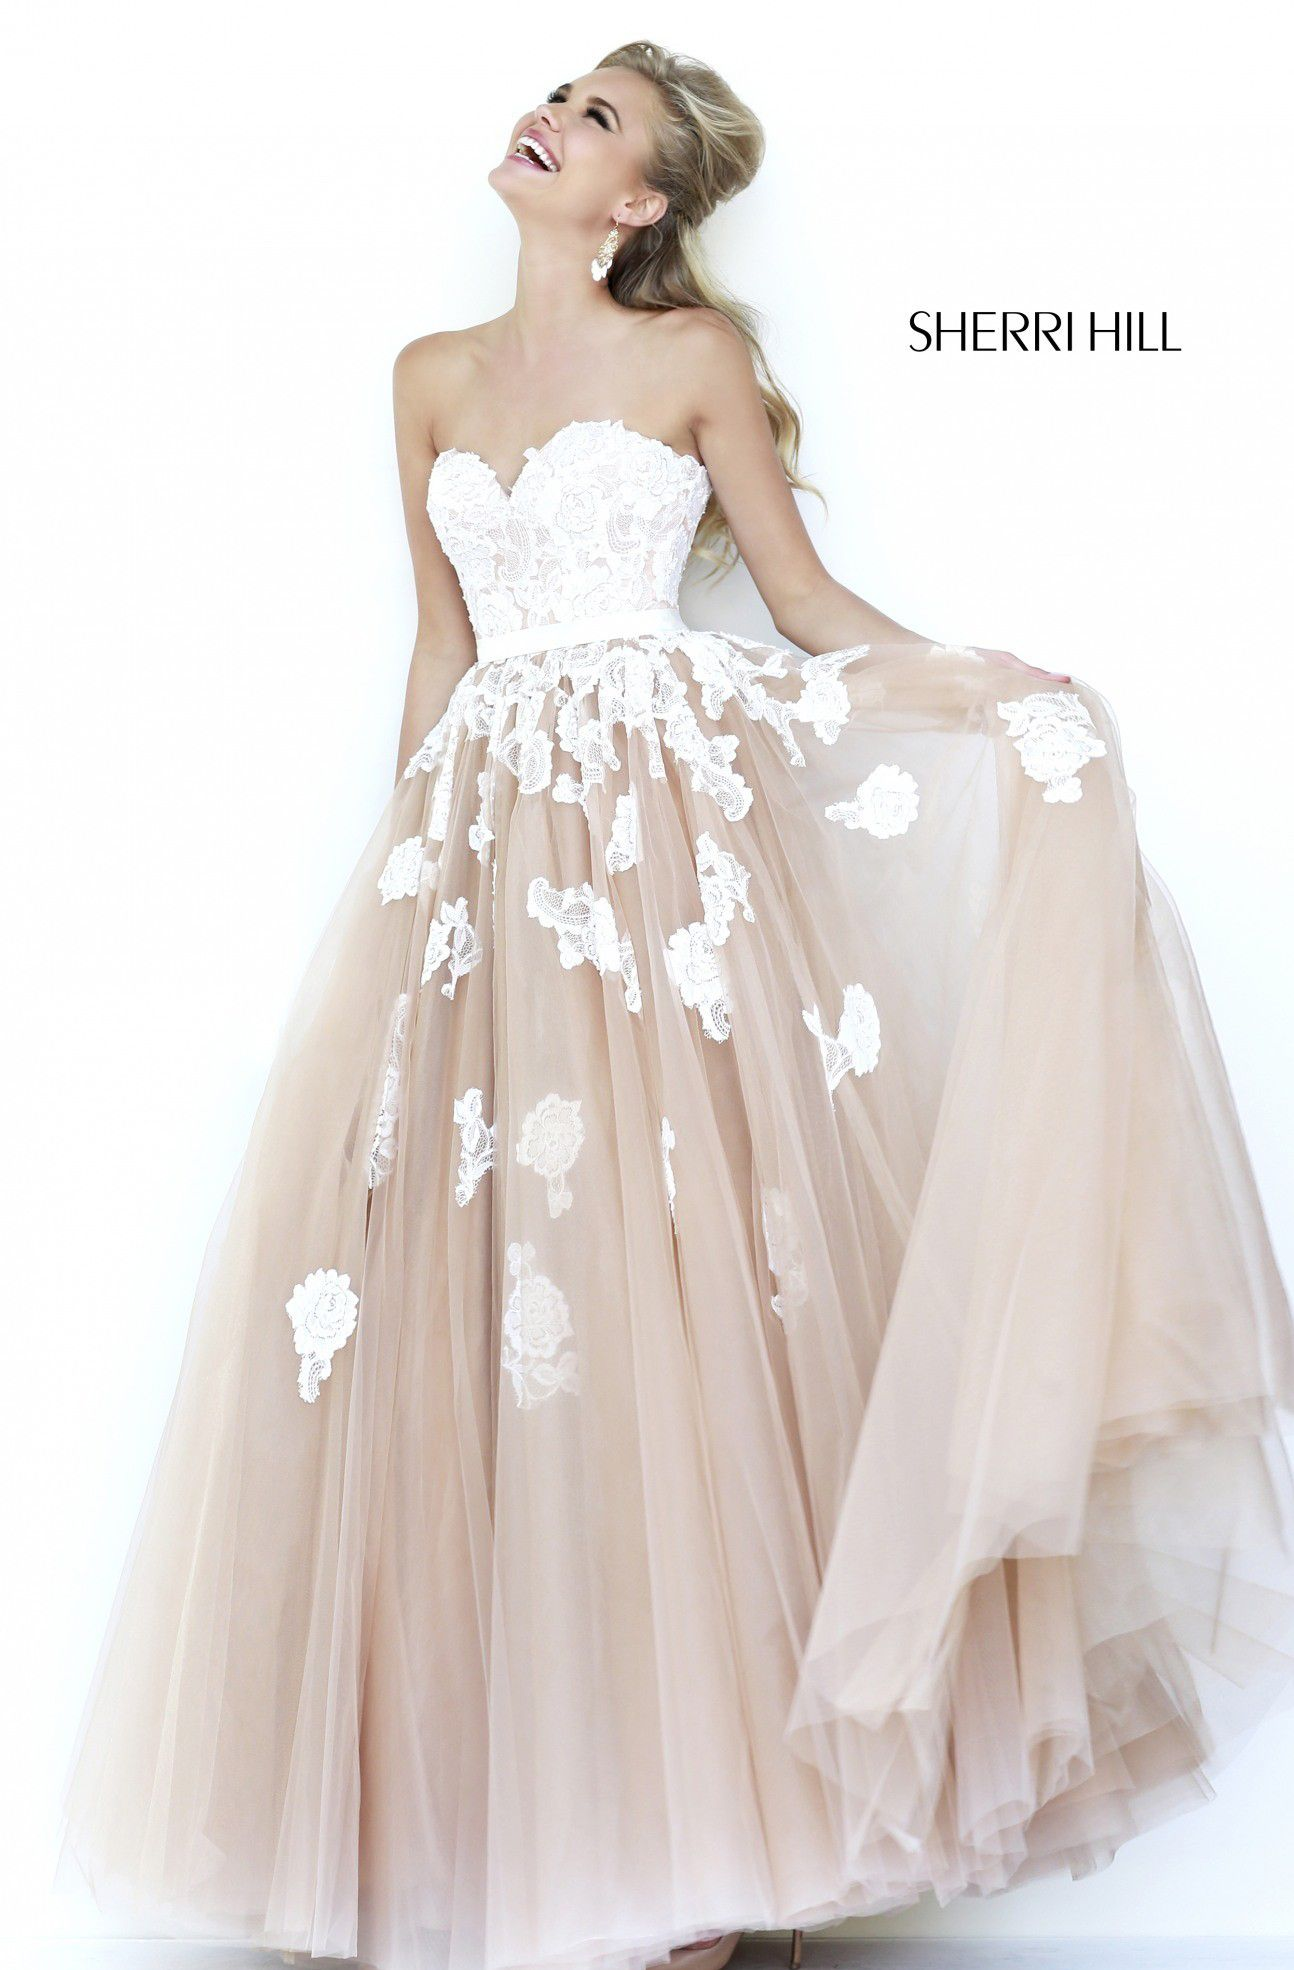 Enlg сукні pinterest